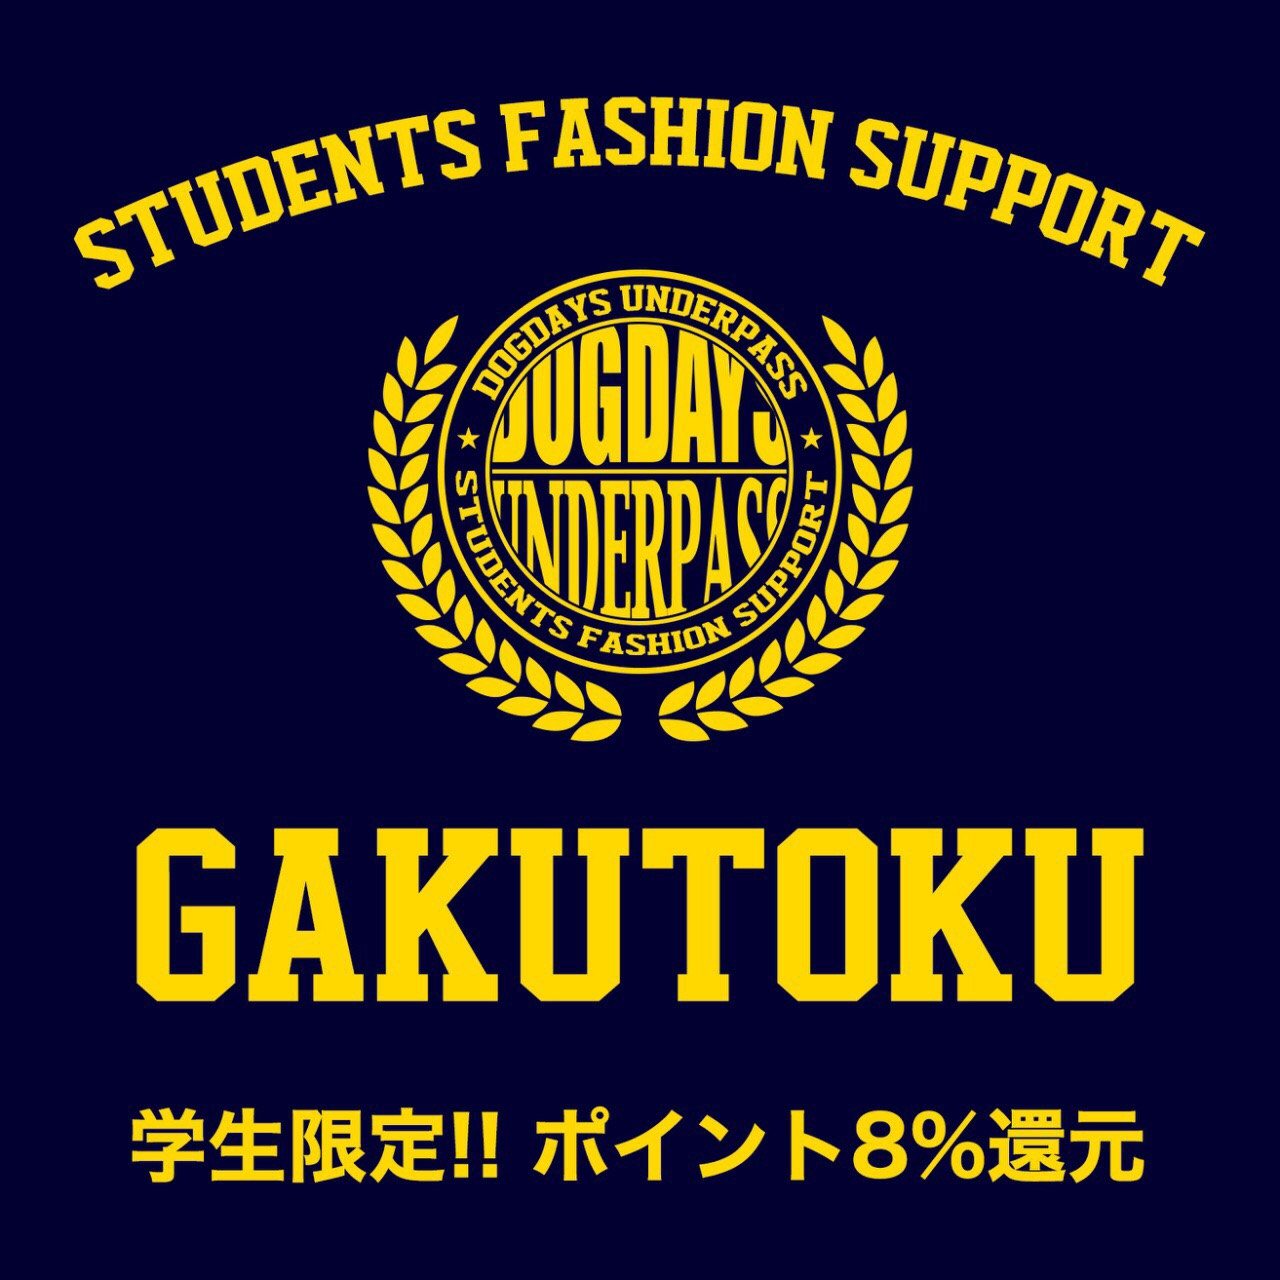 CDG SHIRT , HOMME , JUNYA - Shirts Selections._c0079892_20491631.jpg